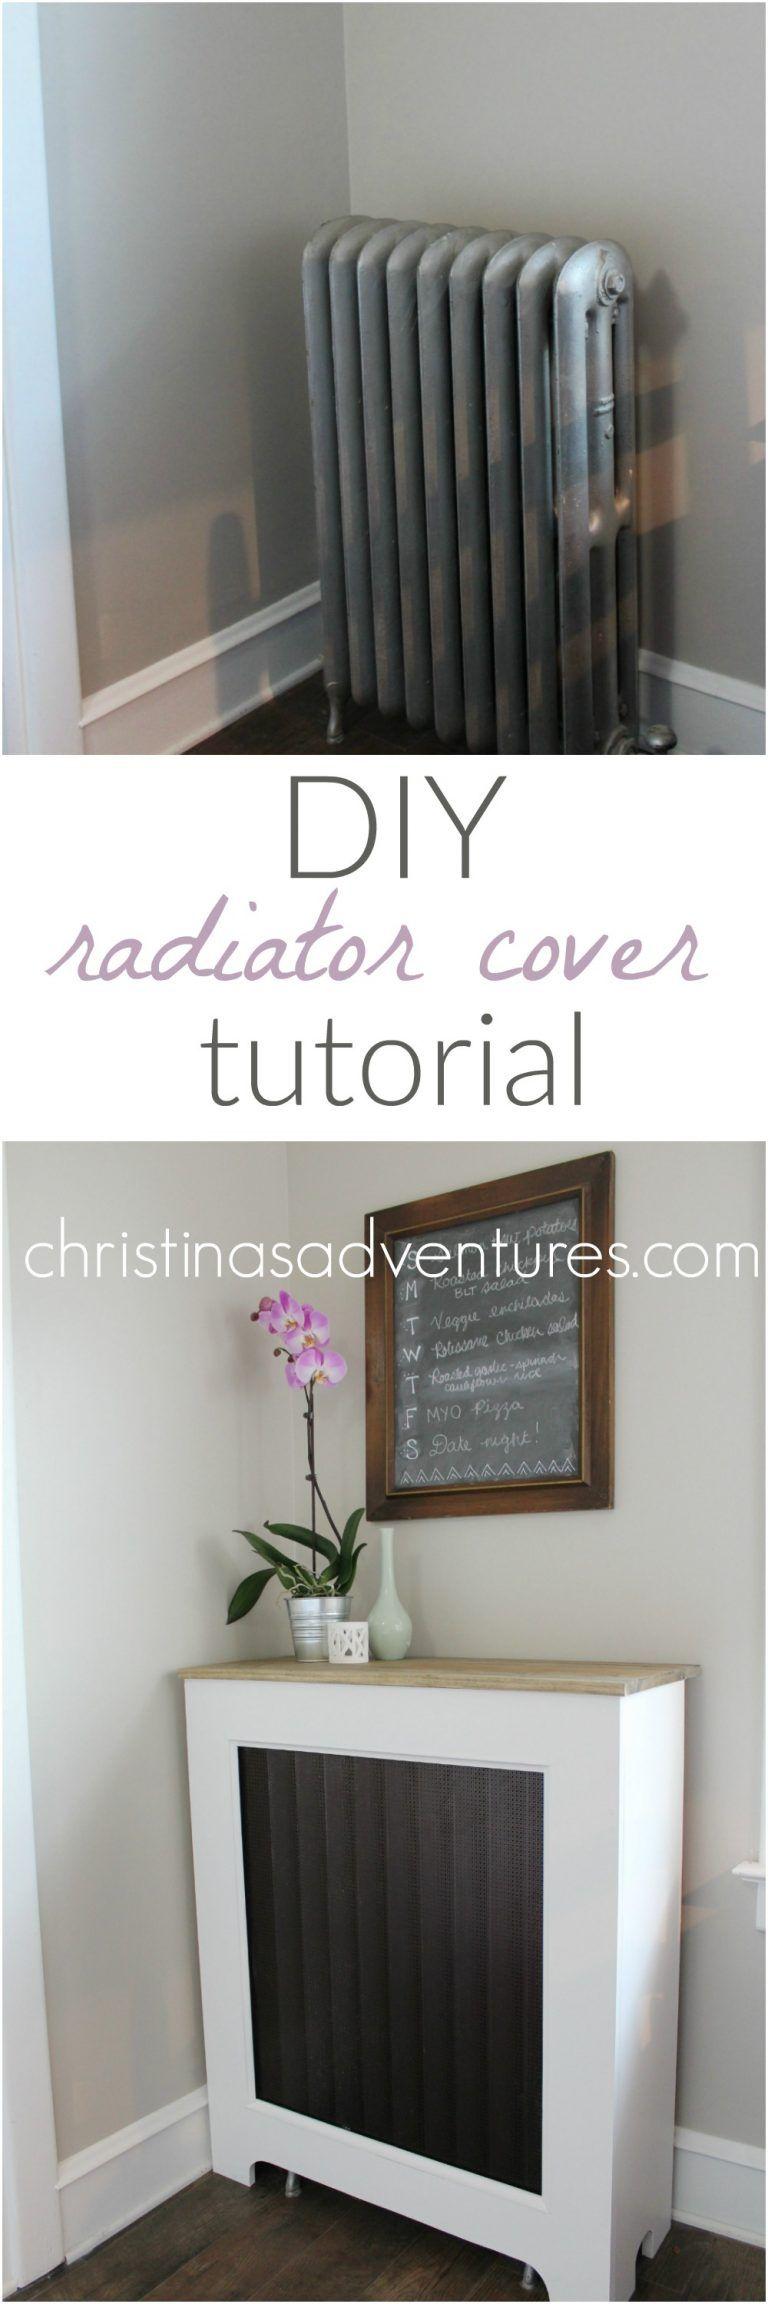 DIY Radiator Cover Tutorial (With images) Diy radiator